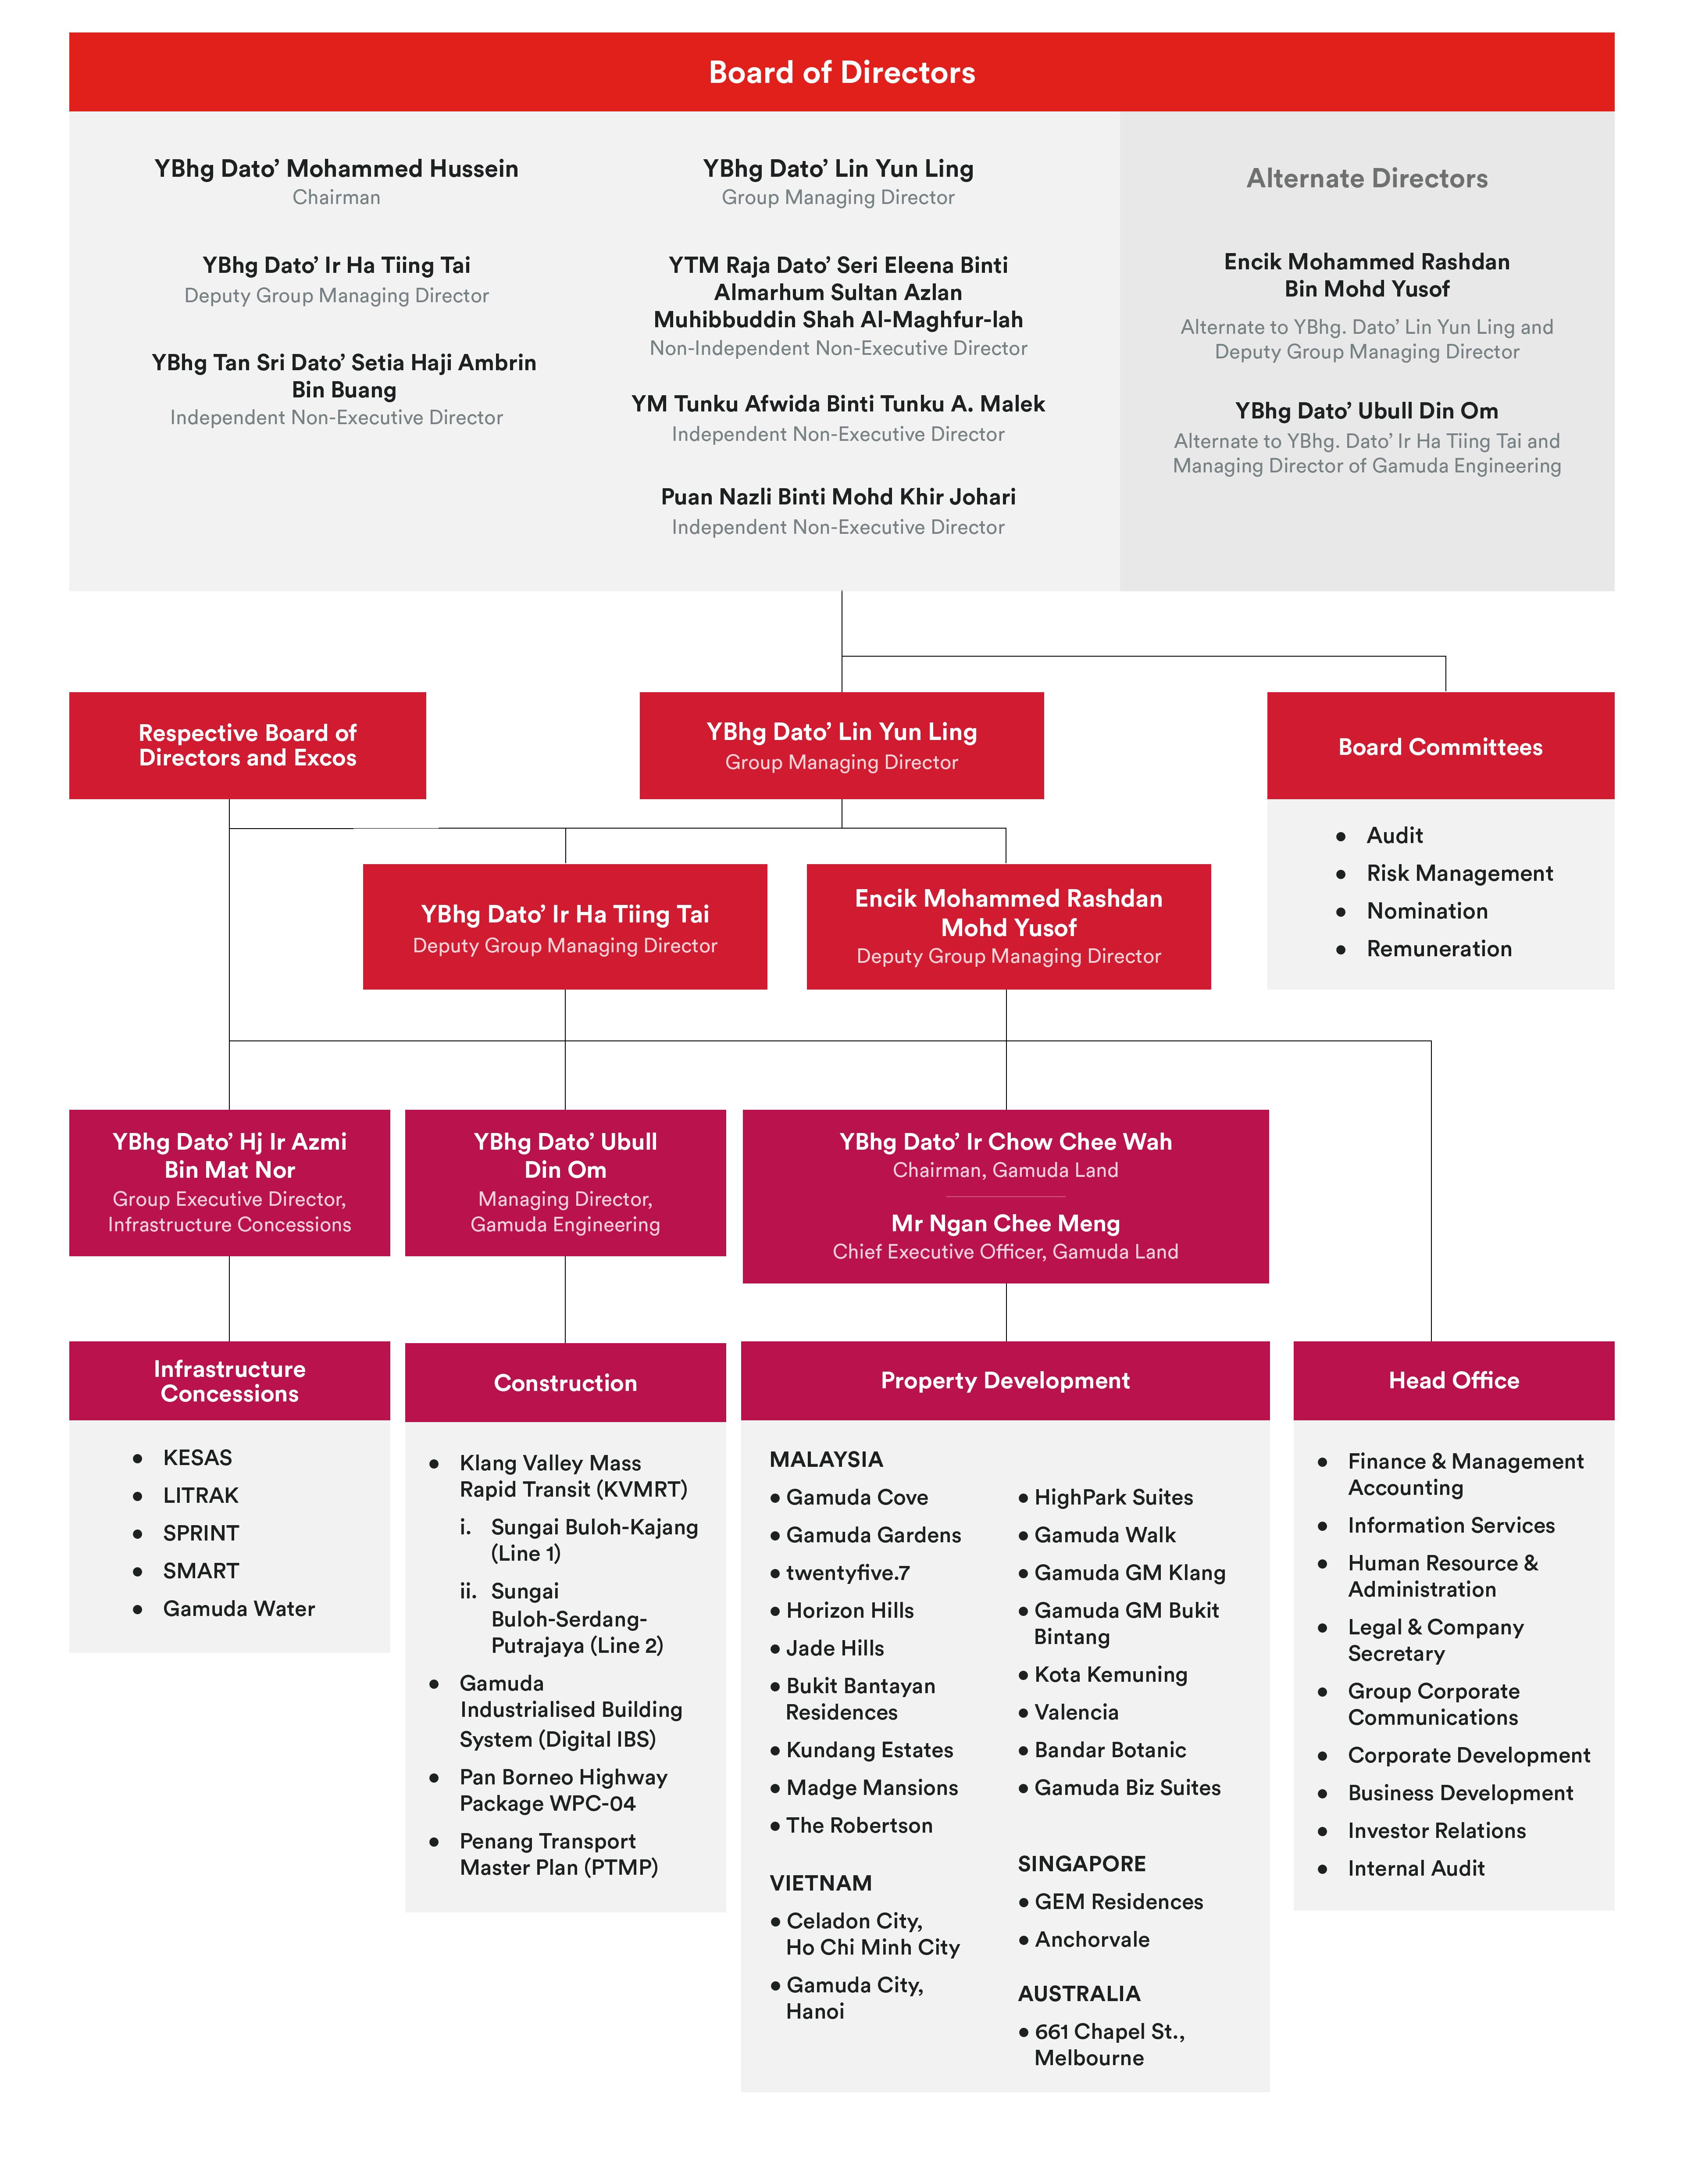 Gamuda Organisational Structure 2018